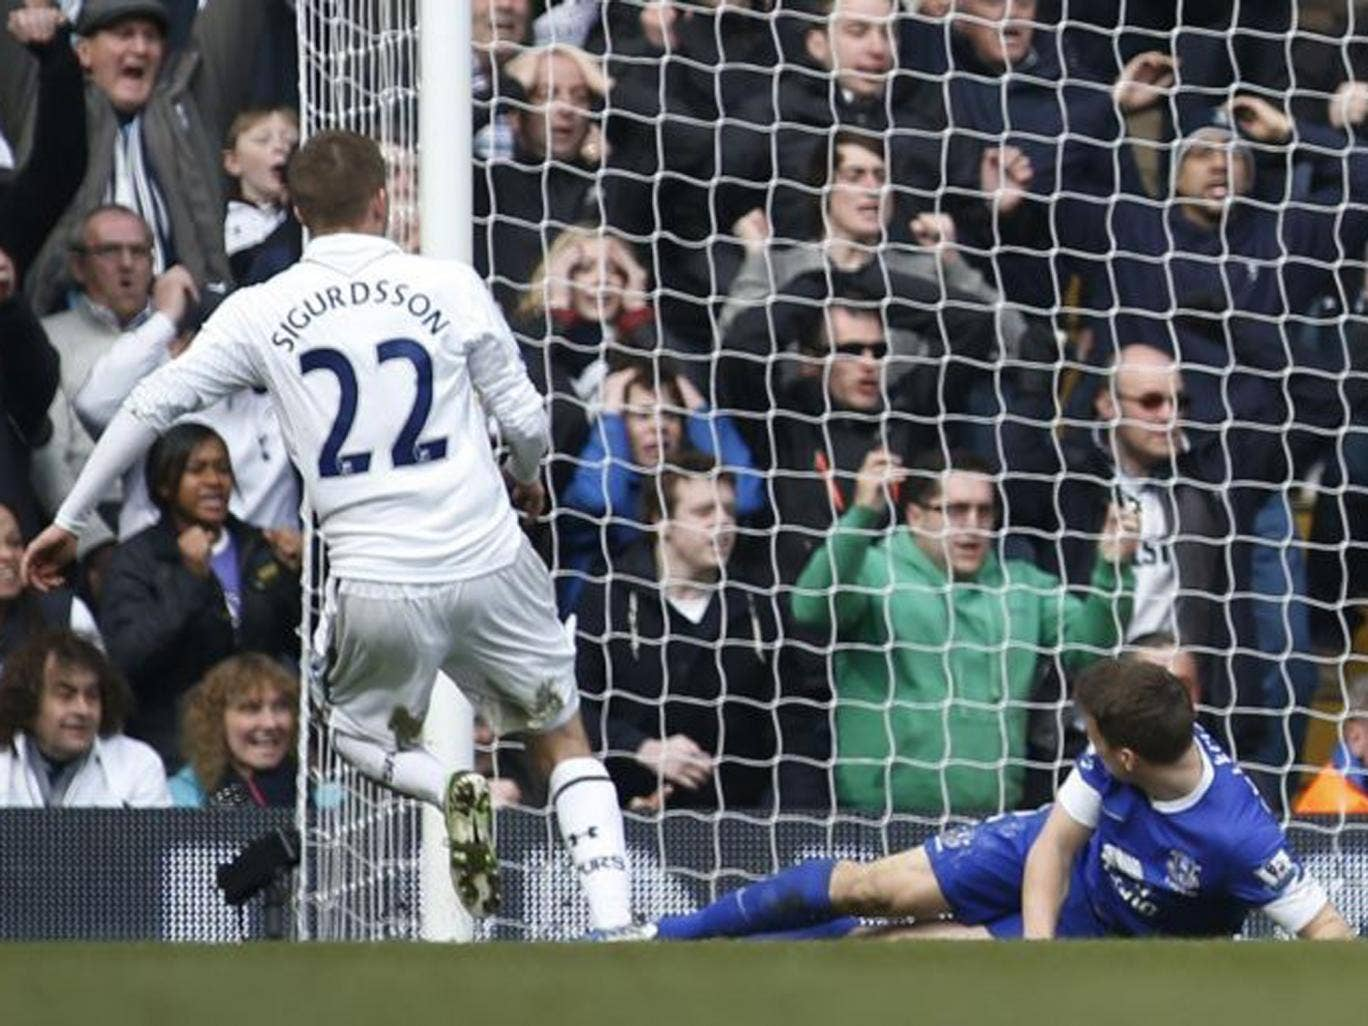 Tottenham Hotspur's Gylfi Sigurdsson scores against Everton